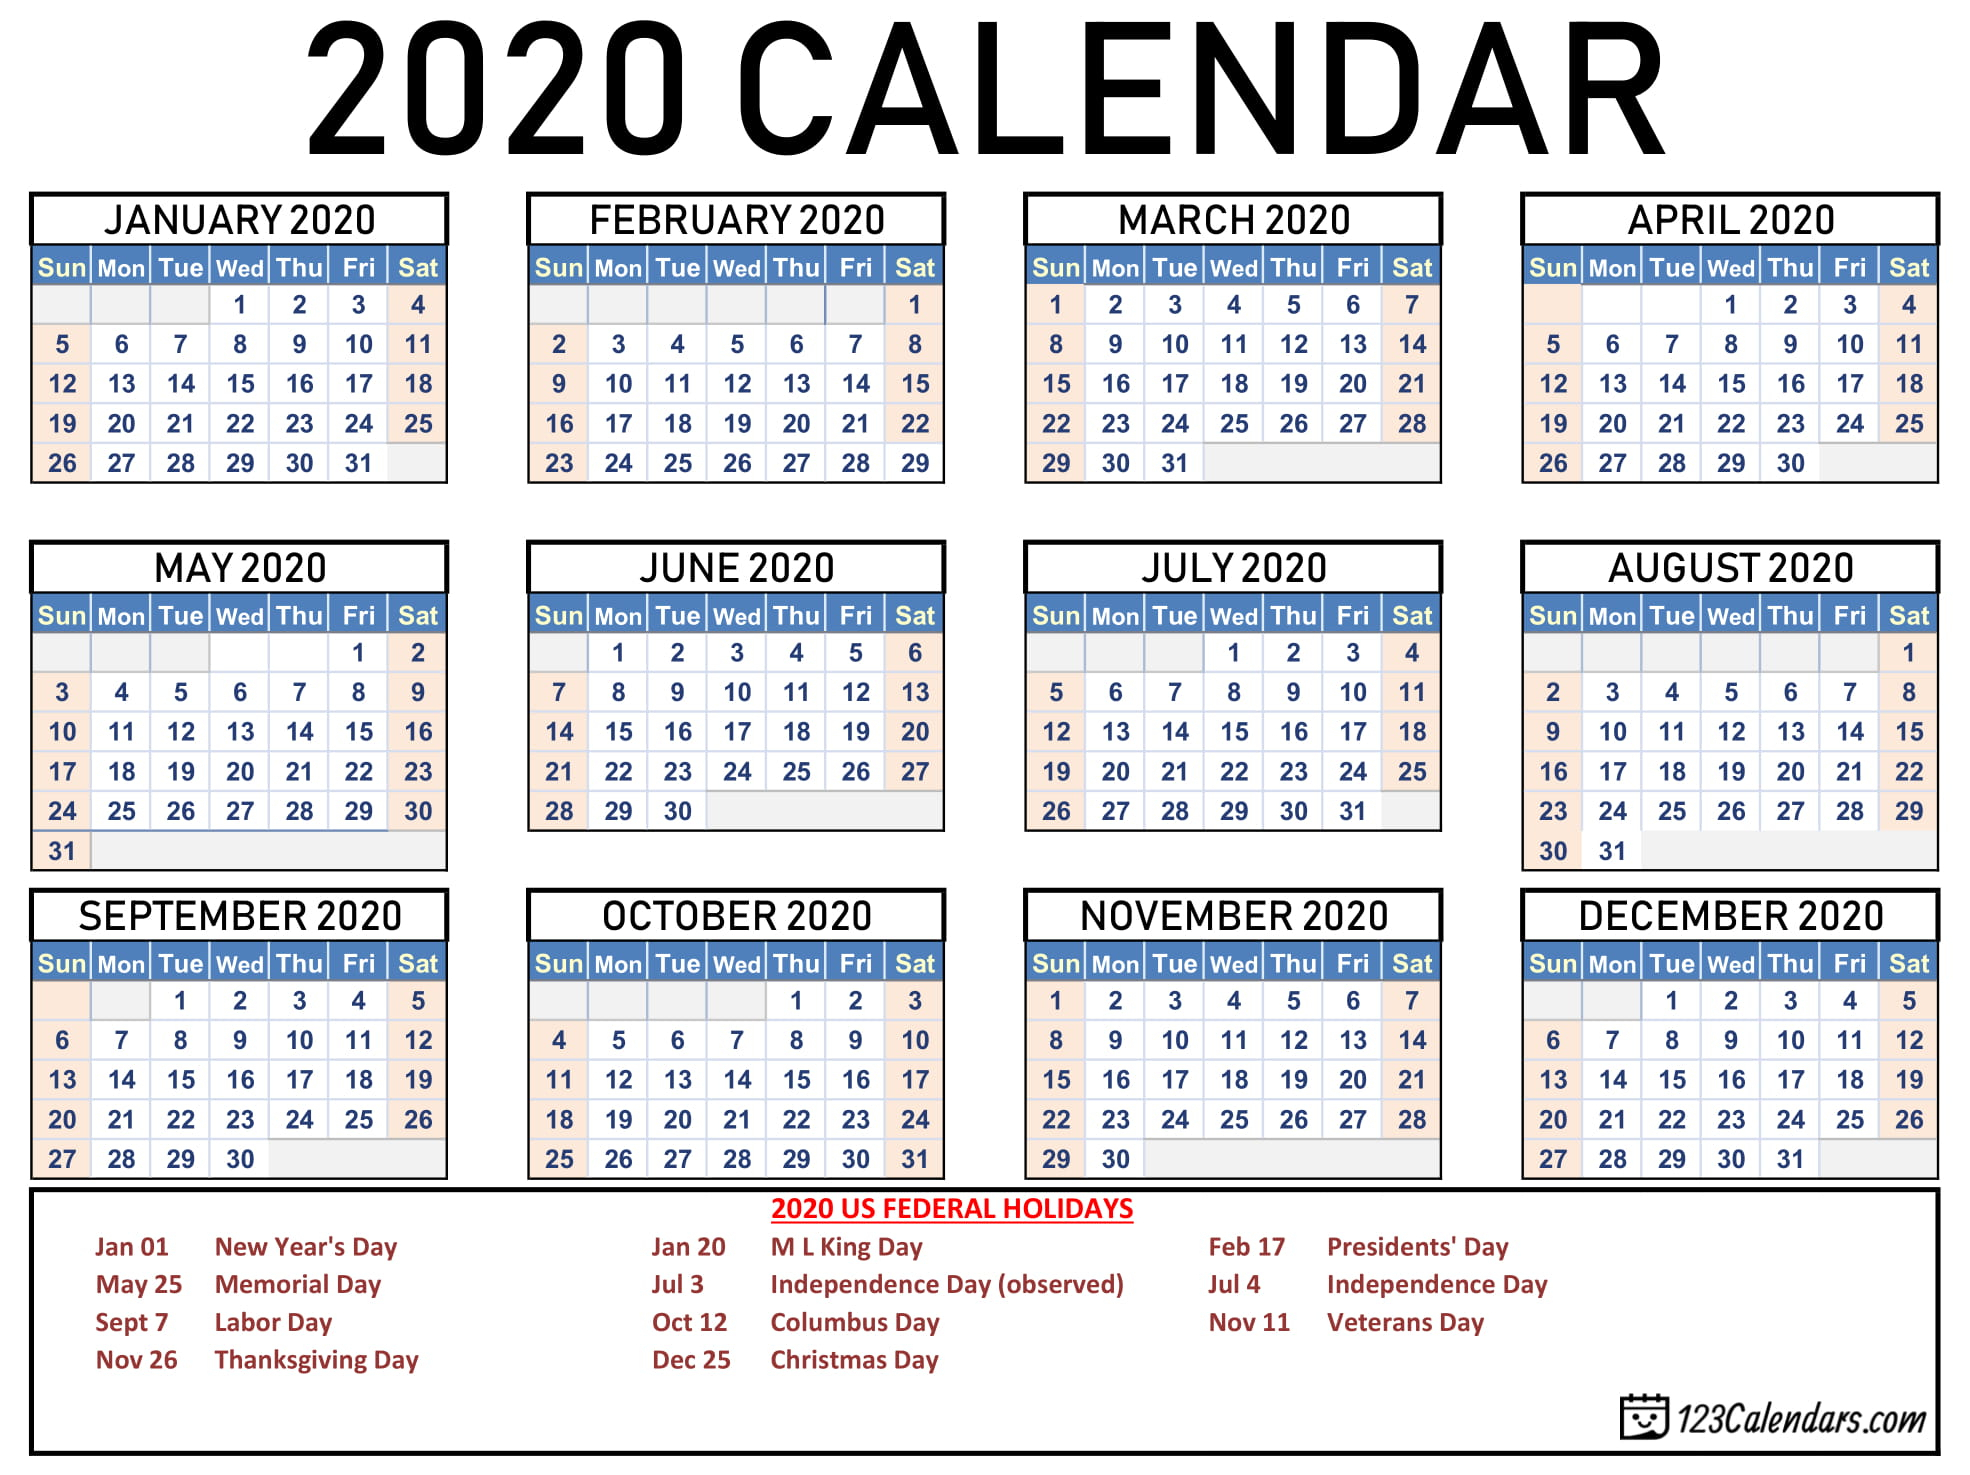 2020 Calendar Federal Holidays | Calendar Printable Free